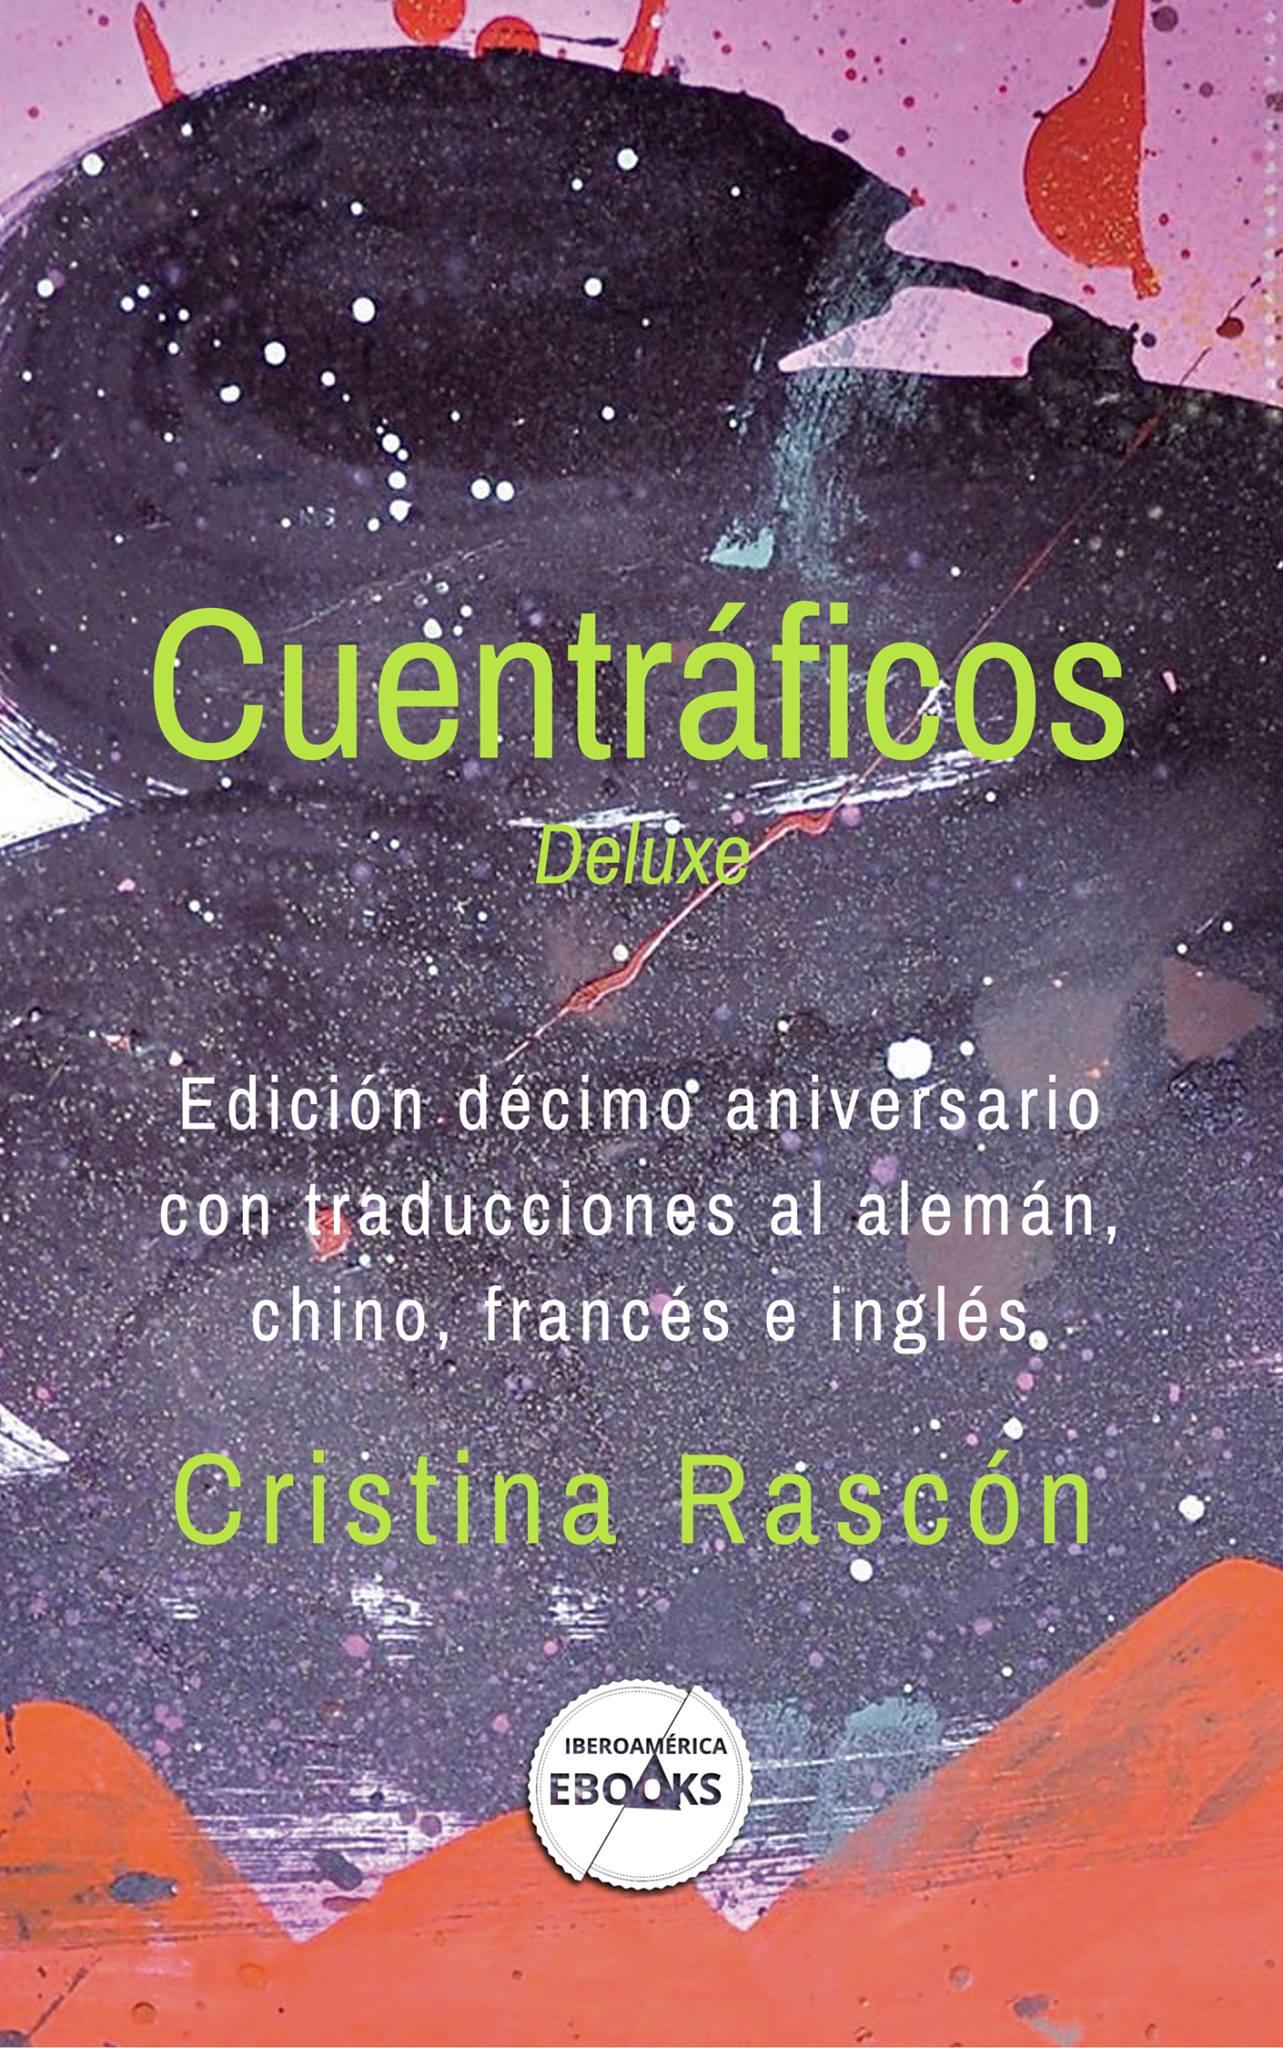 Cuentráficos 10 años después gracias a Iberoamérica Ebooks